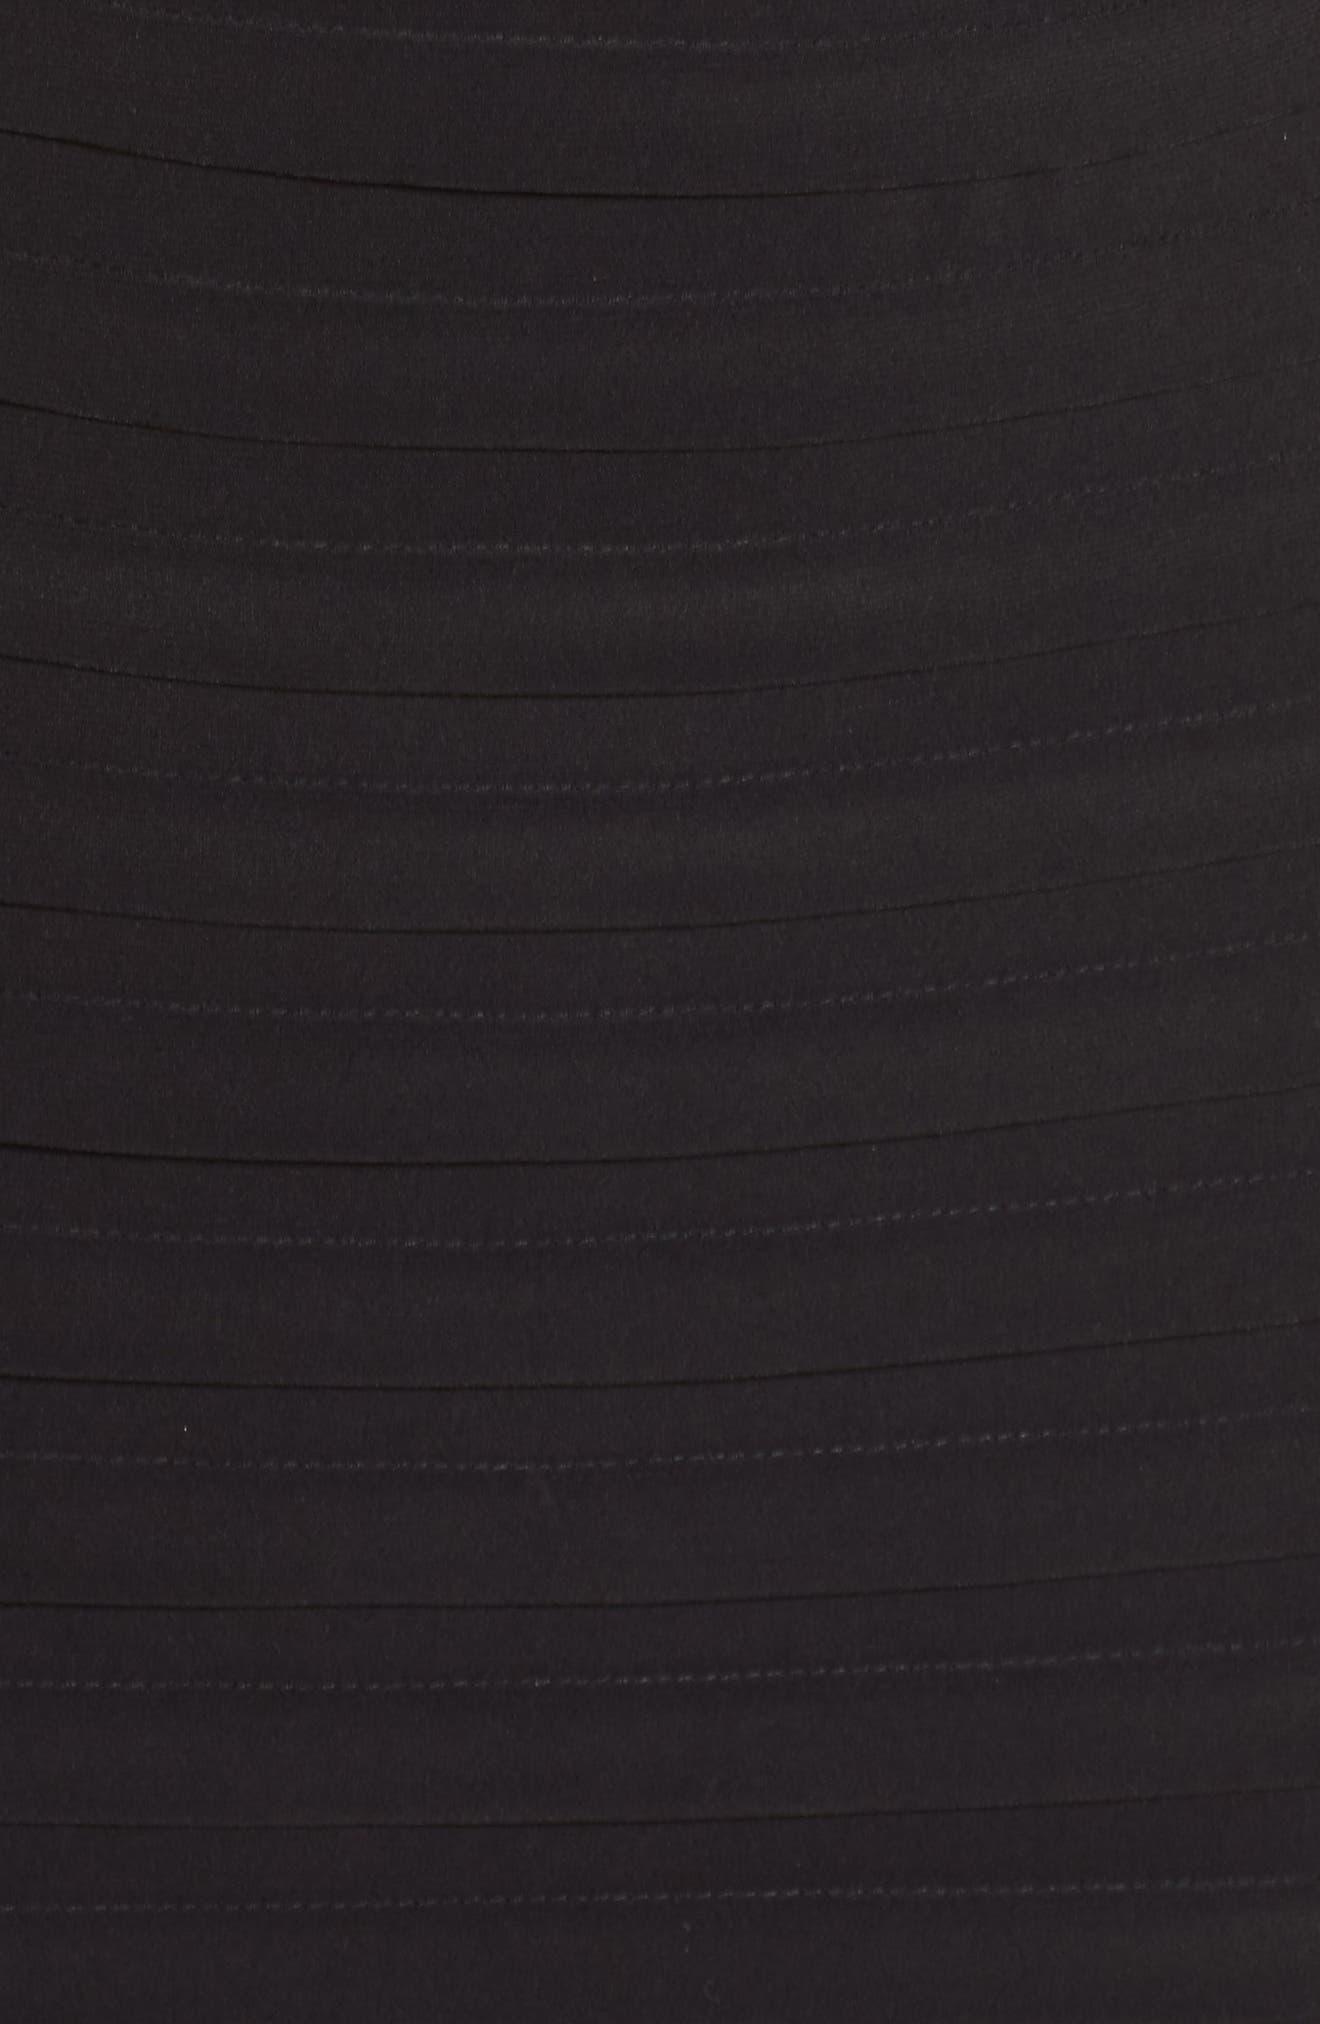 Banded Sheath Dress,                             Alternate thumbnail 5, color,                             002